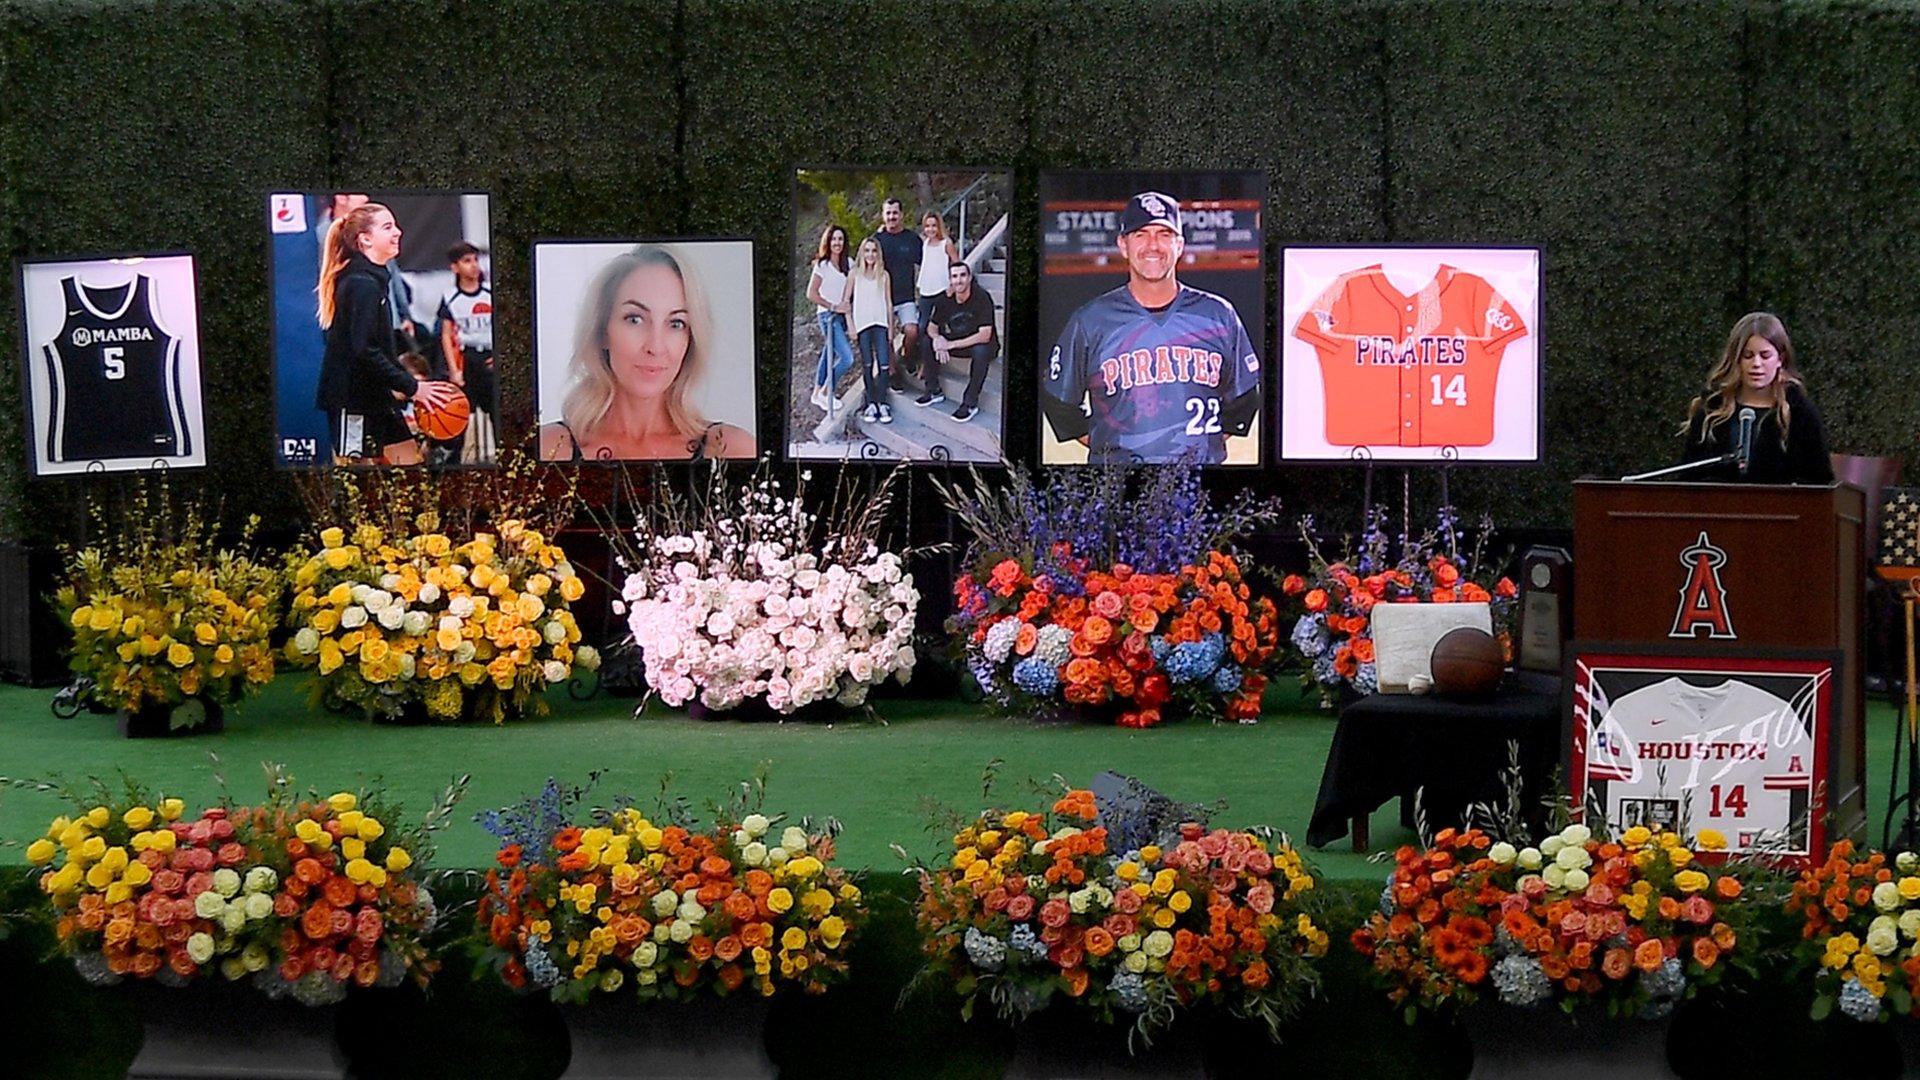 Sammy Forbath, best friend of Alyssa Altobelli, speaks at a memorial service honoring baseball coach John Altobelli, his wife, Keri, and their daughter Alyssa at Angel Stadium on Feb. 10, 2020. (Credit: Jayne Kamin-Oncea / Getty Images)